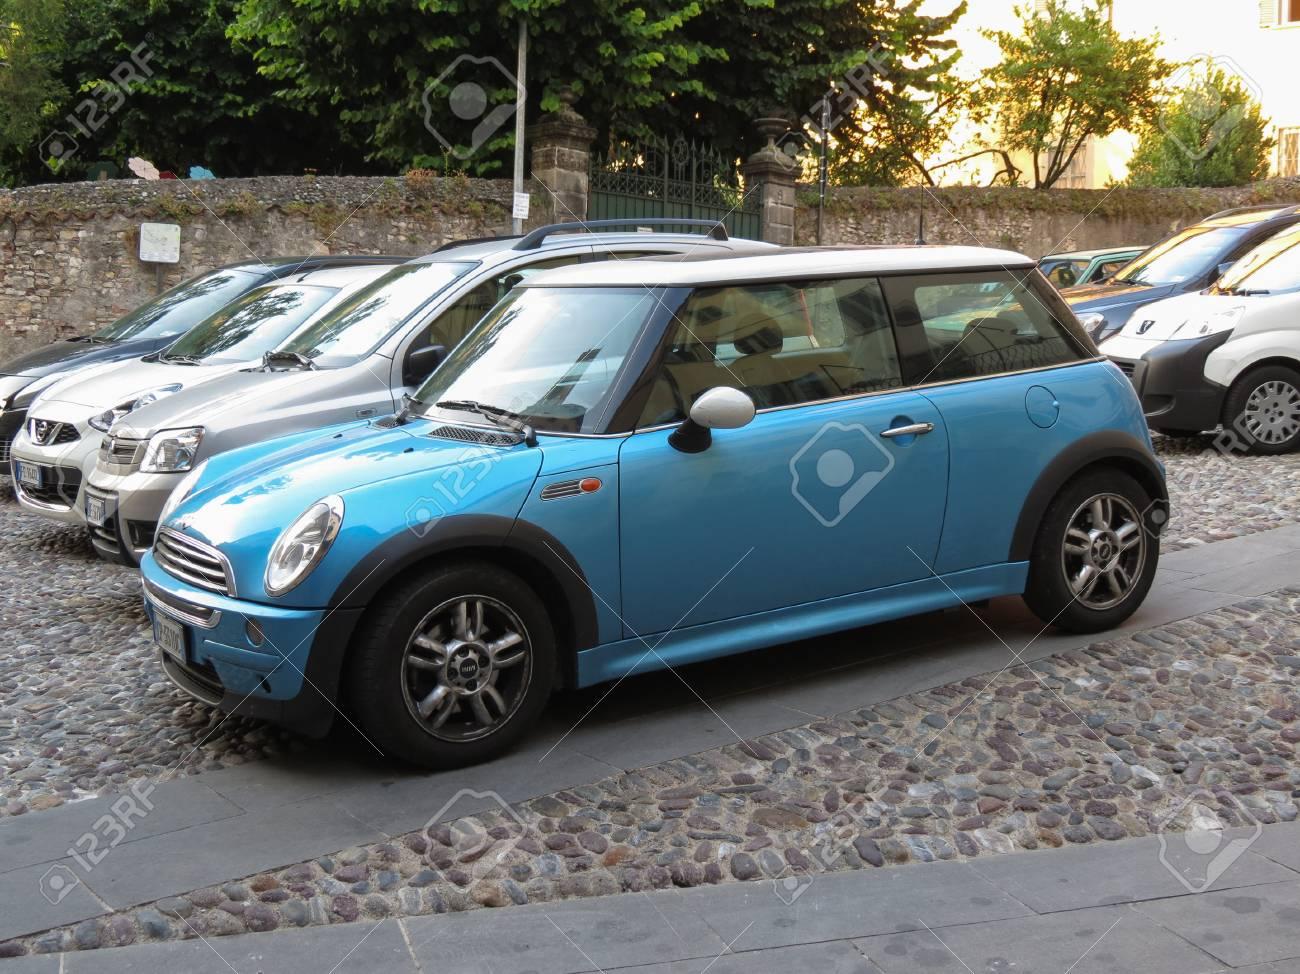 Bergamo Italy Circa July 2017 Blue Mini Cooper Car Parked